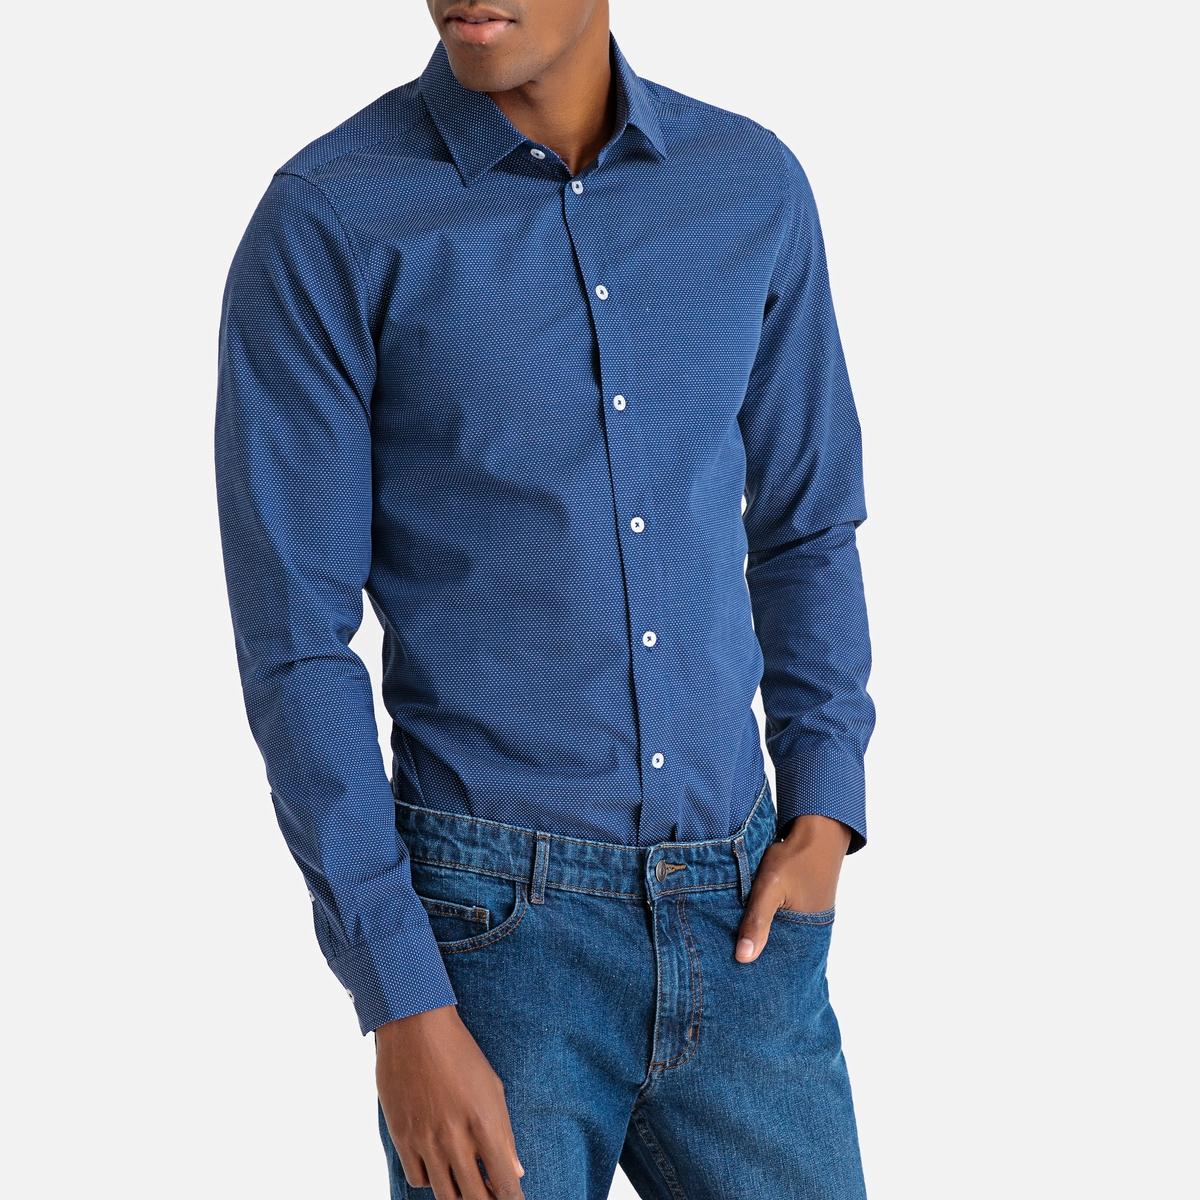 цена Рубашка La Redoute Узкого покроя с рисунком и длинными рукавами 45/46 синий онлайн в 2017 году